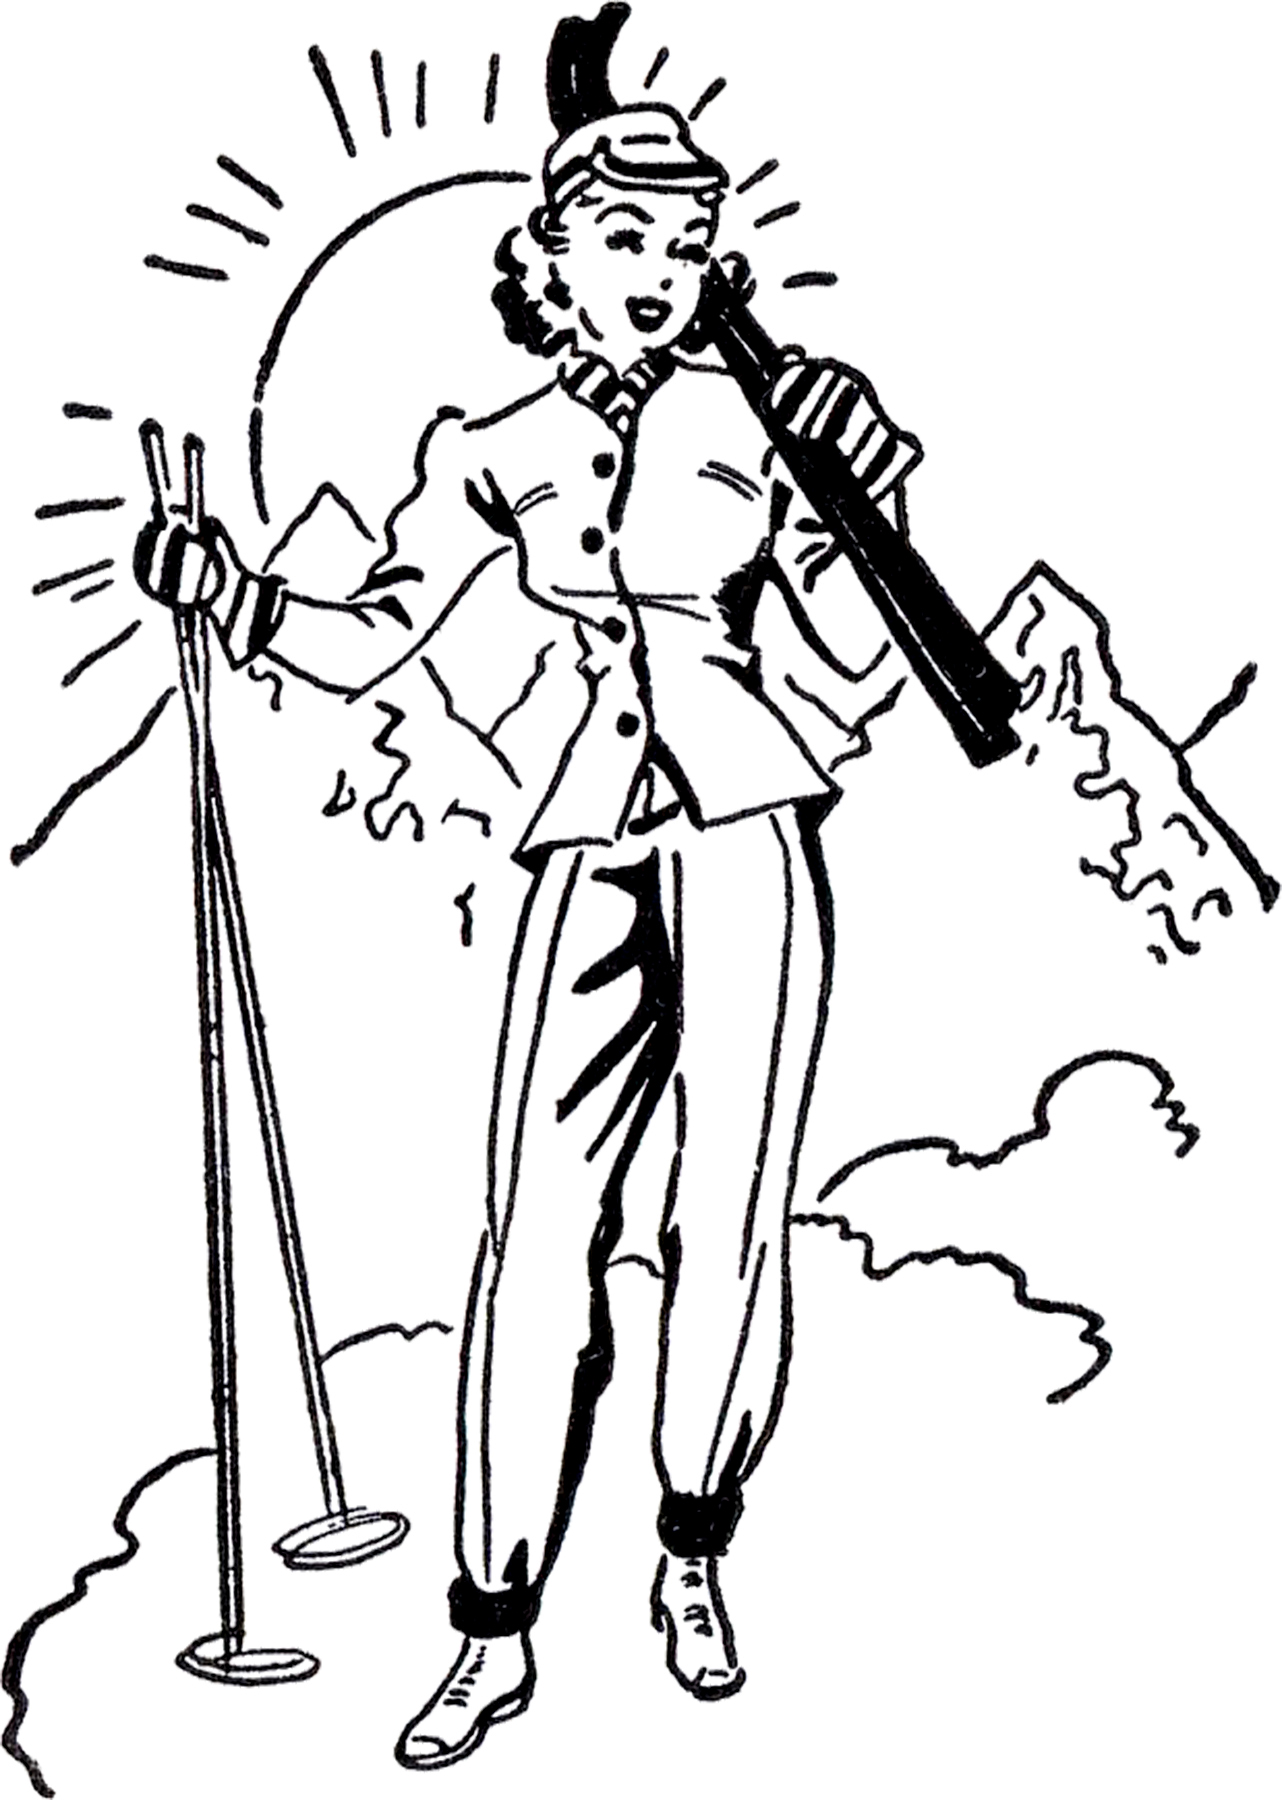 Retro Ski Lady Image The Graphics Fairy